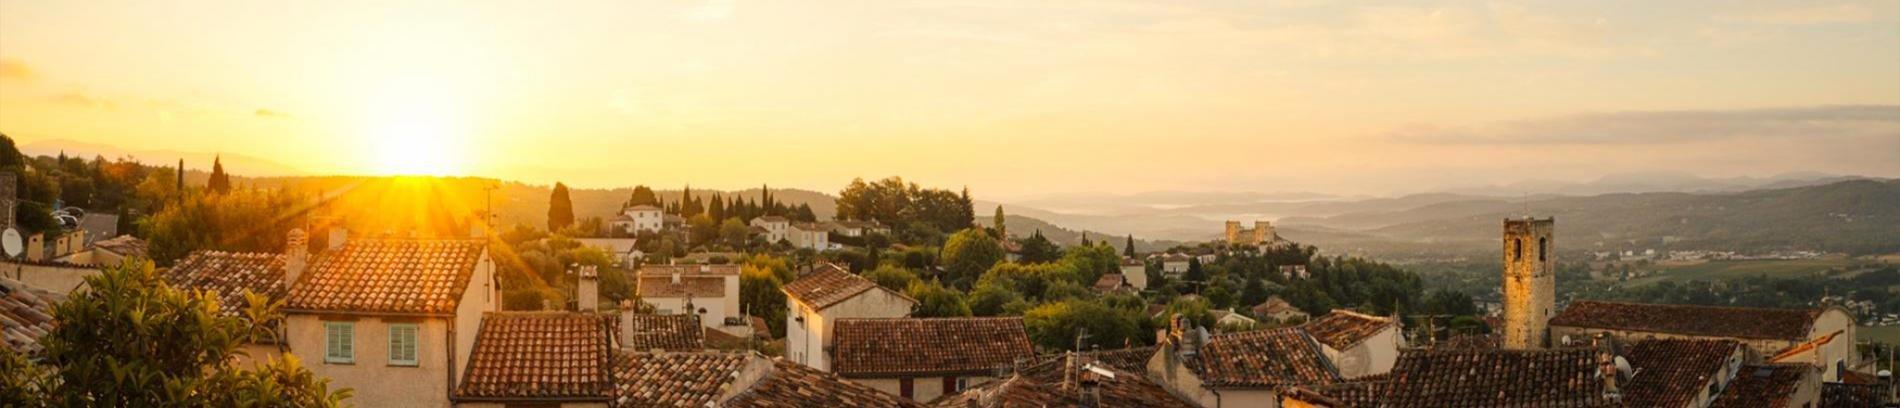 Slide le village de Fayence